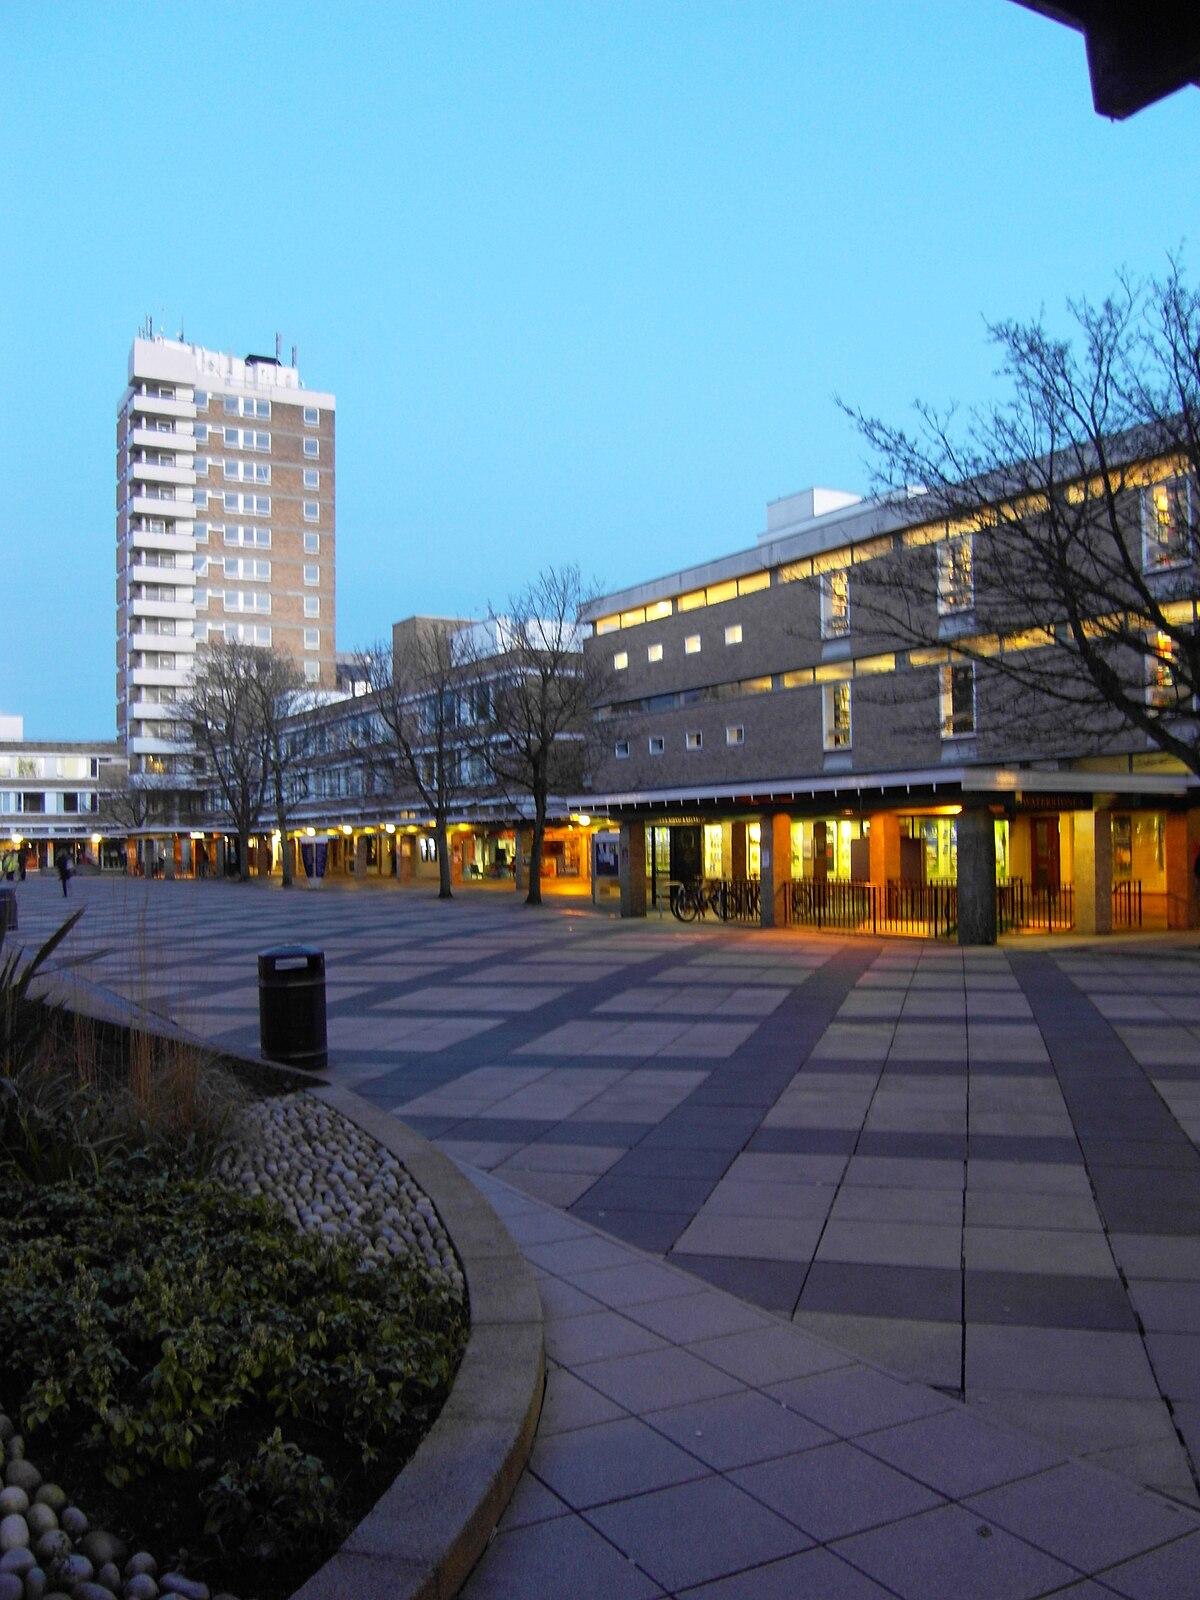 siti di incontri West Sussex BBC News online incontri cliché